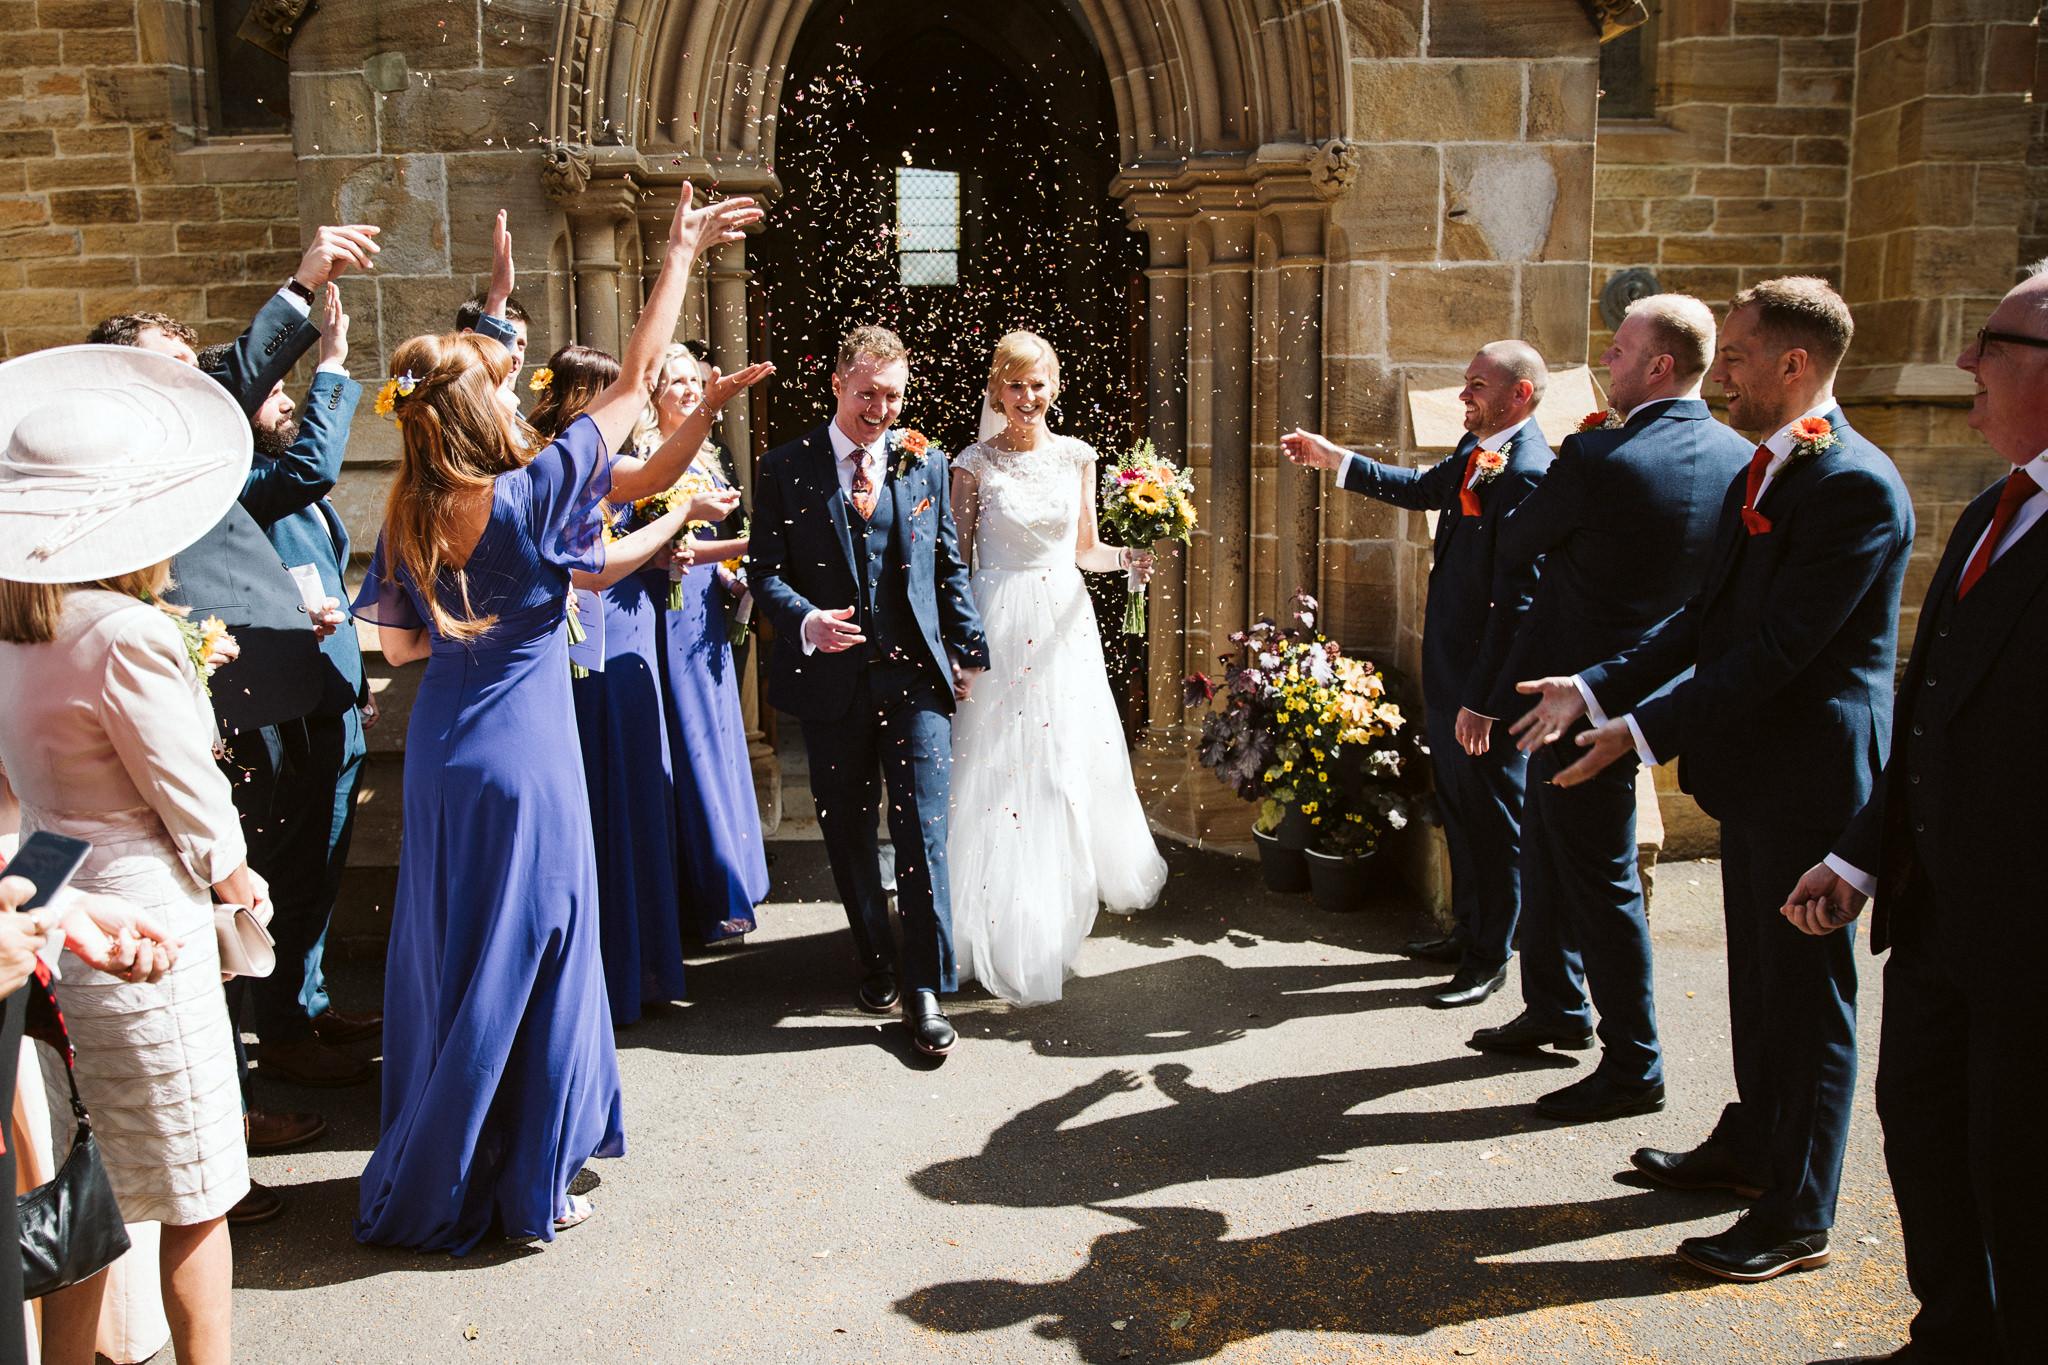 northside-farm-wedding-northumberland-margarita-hope (31).jpg